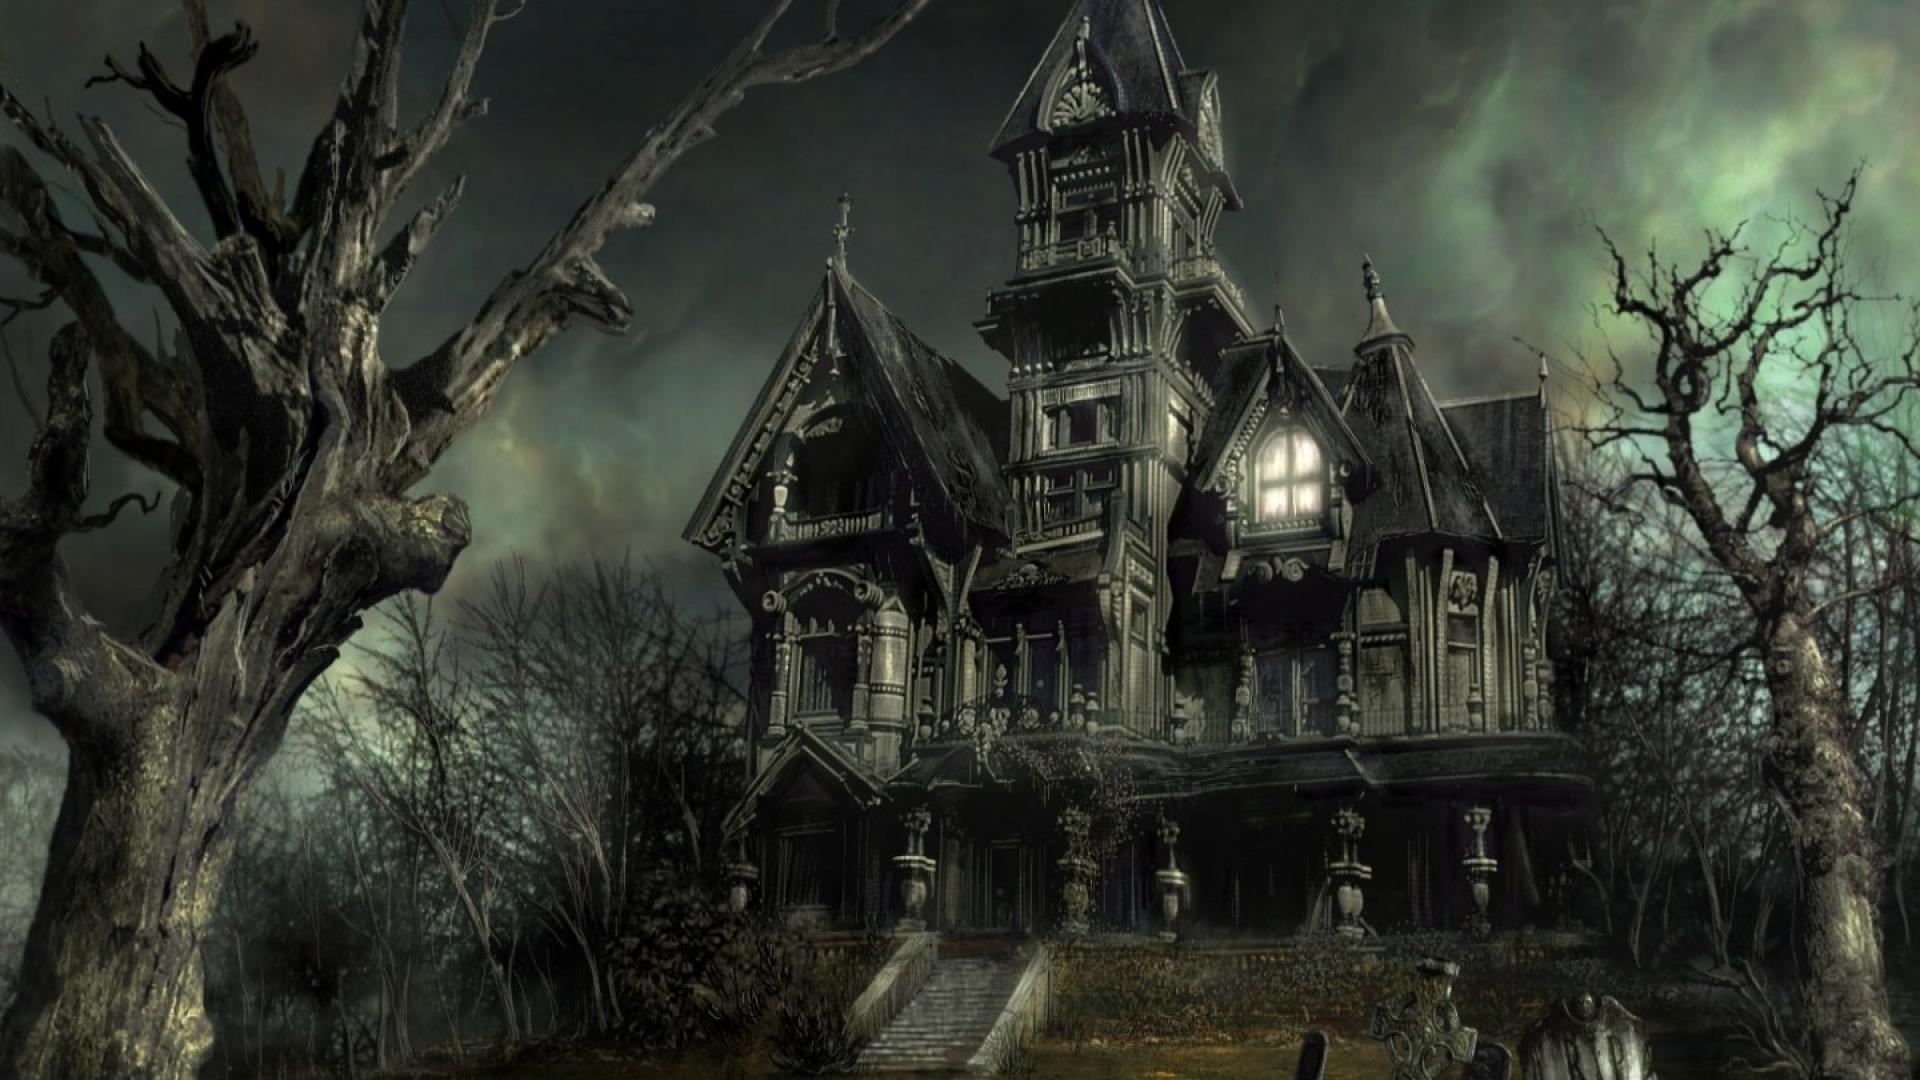 cgi 3d haunted house wallpaper | (121186)